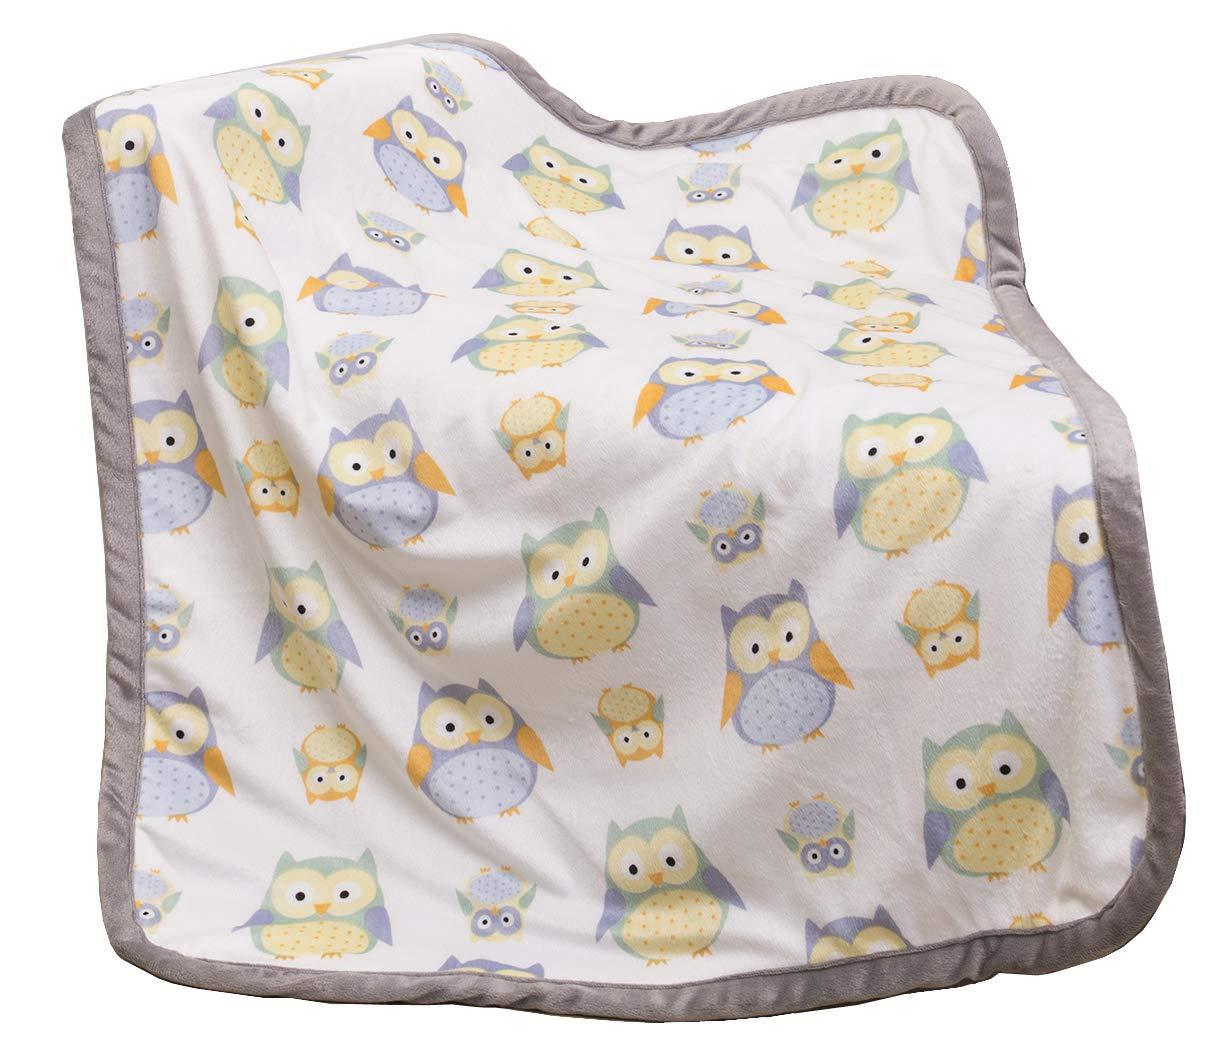 "Sunshine Baby Blanket Print Fleece Gift for Newborn Prince Princess 30"" x 40"" product image"